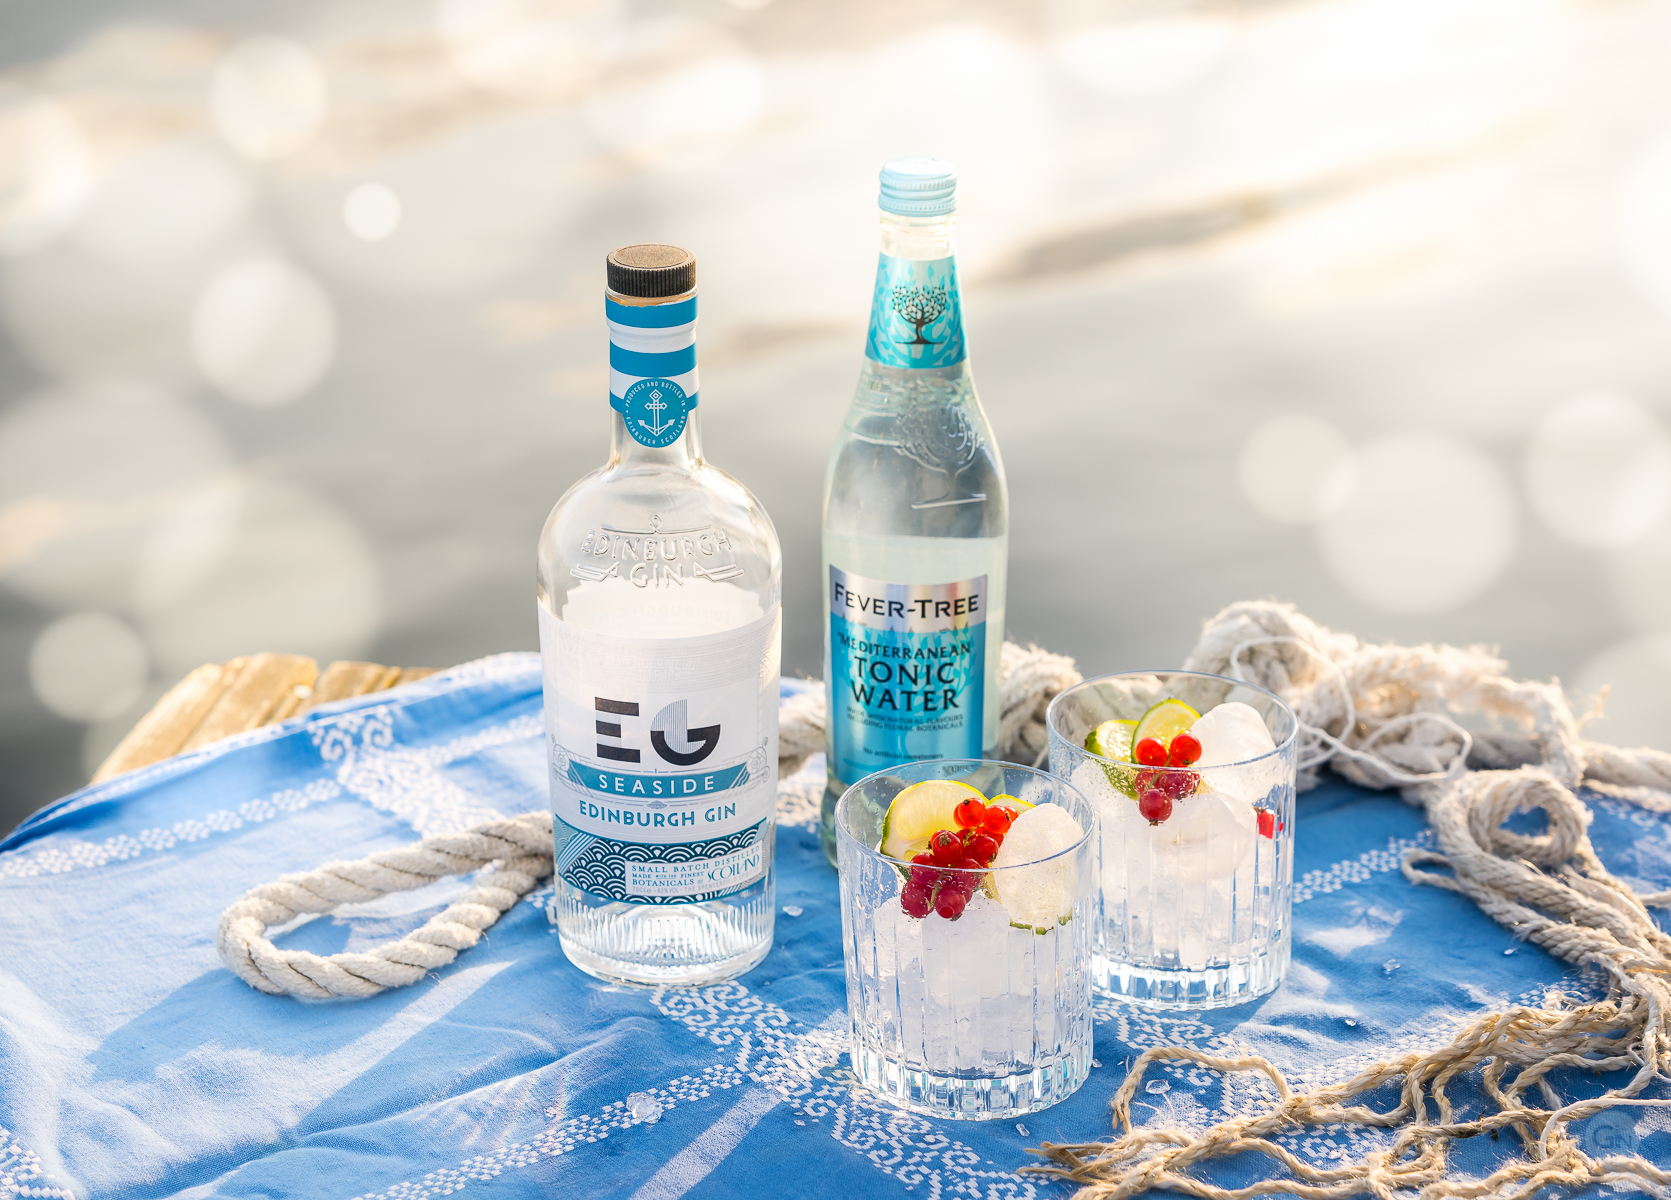 Edinburgh Seaside Gin and Tonic. Photo by Michael Sperling.